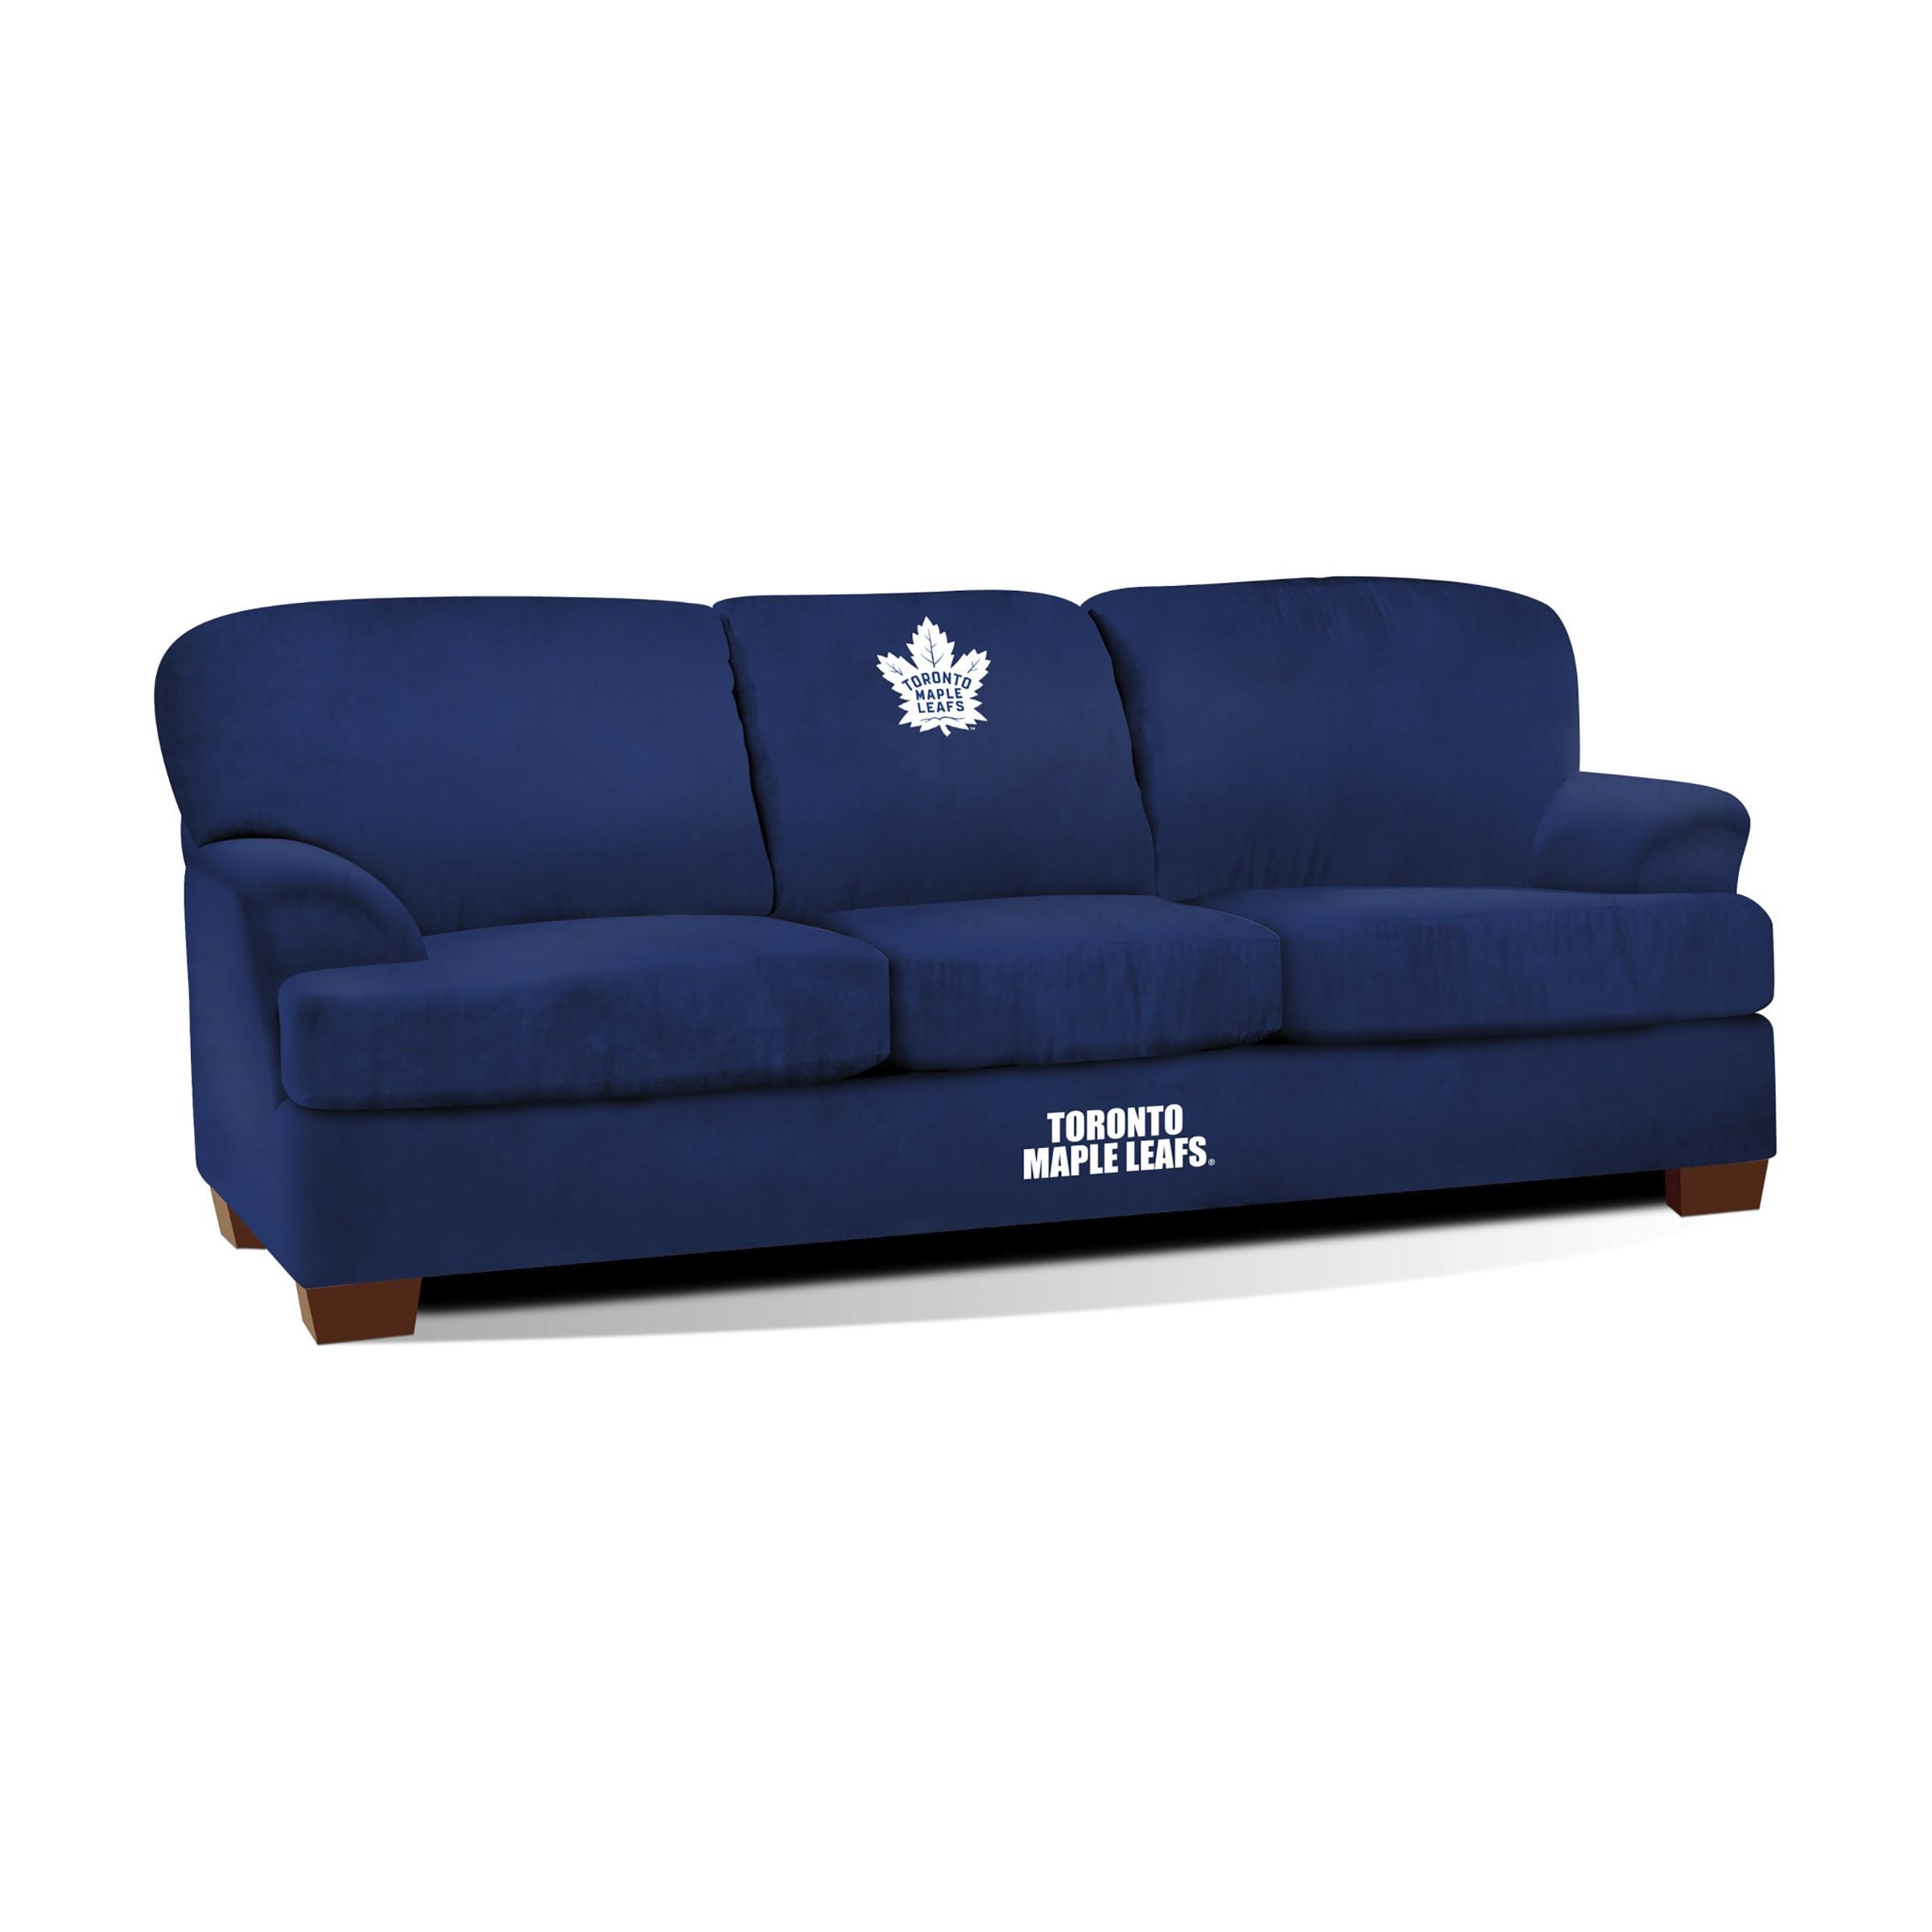 Sofa en microfibre Toronto Maple Leafs®